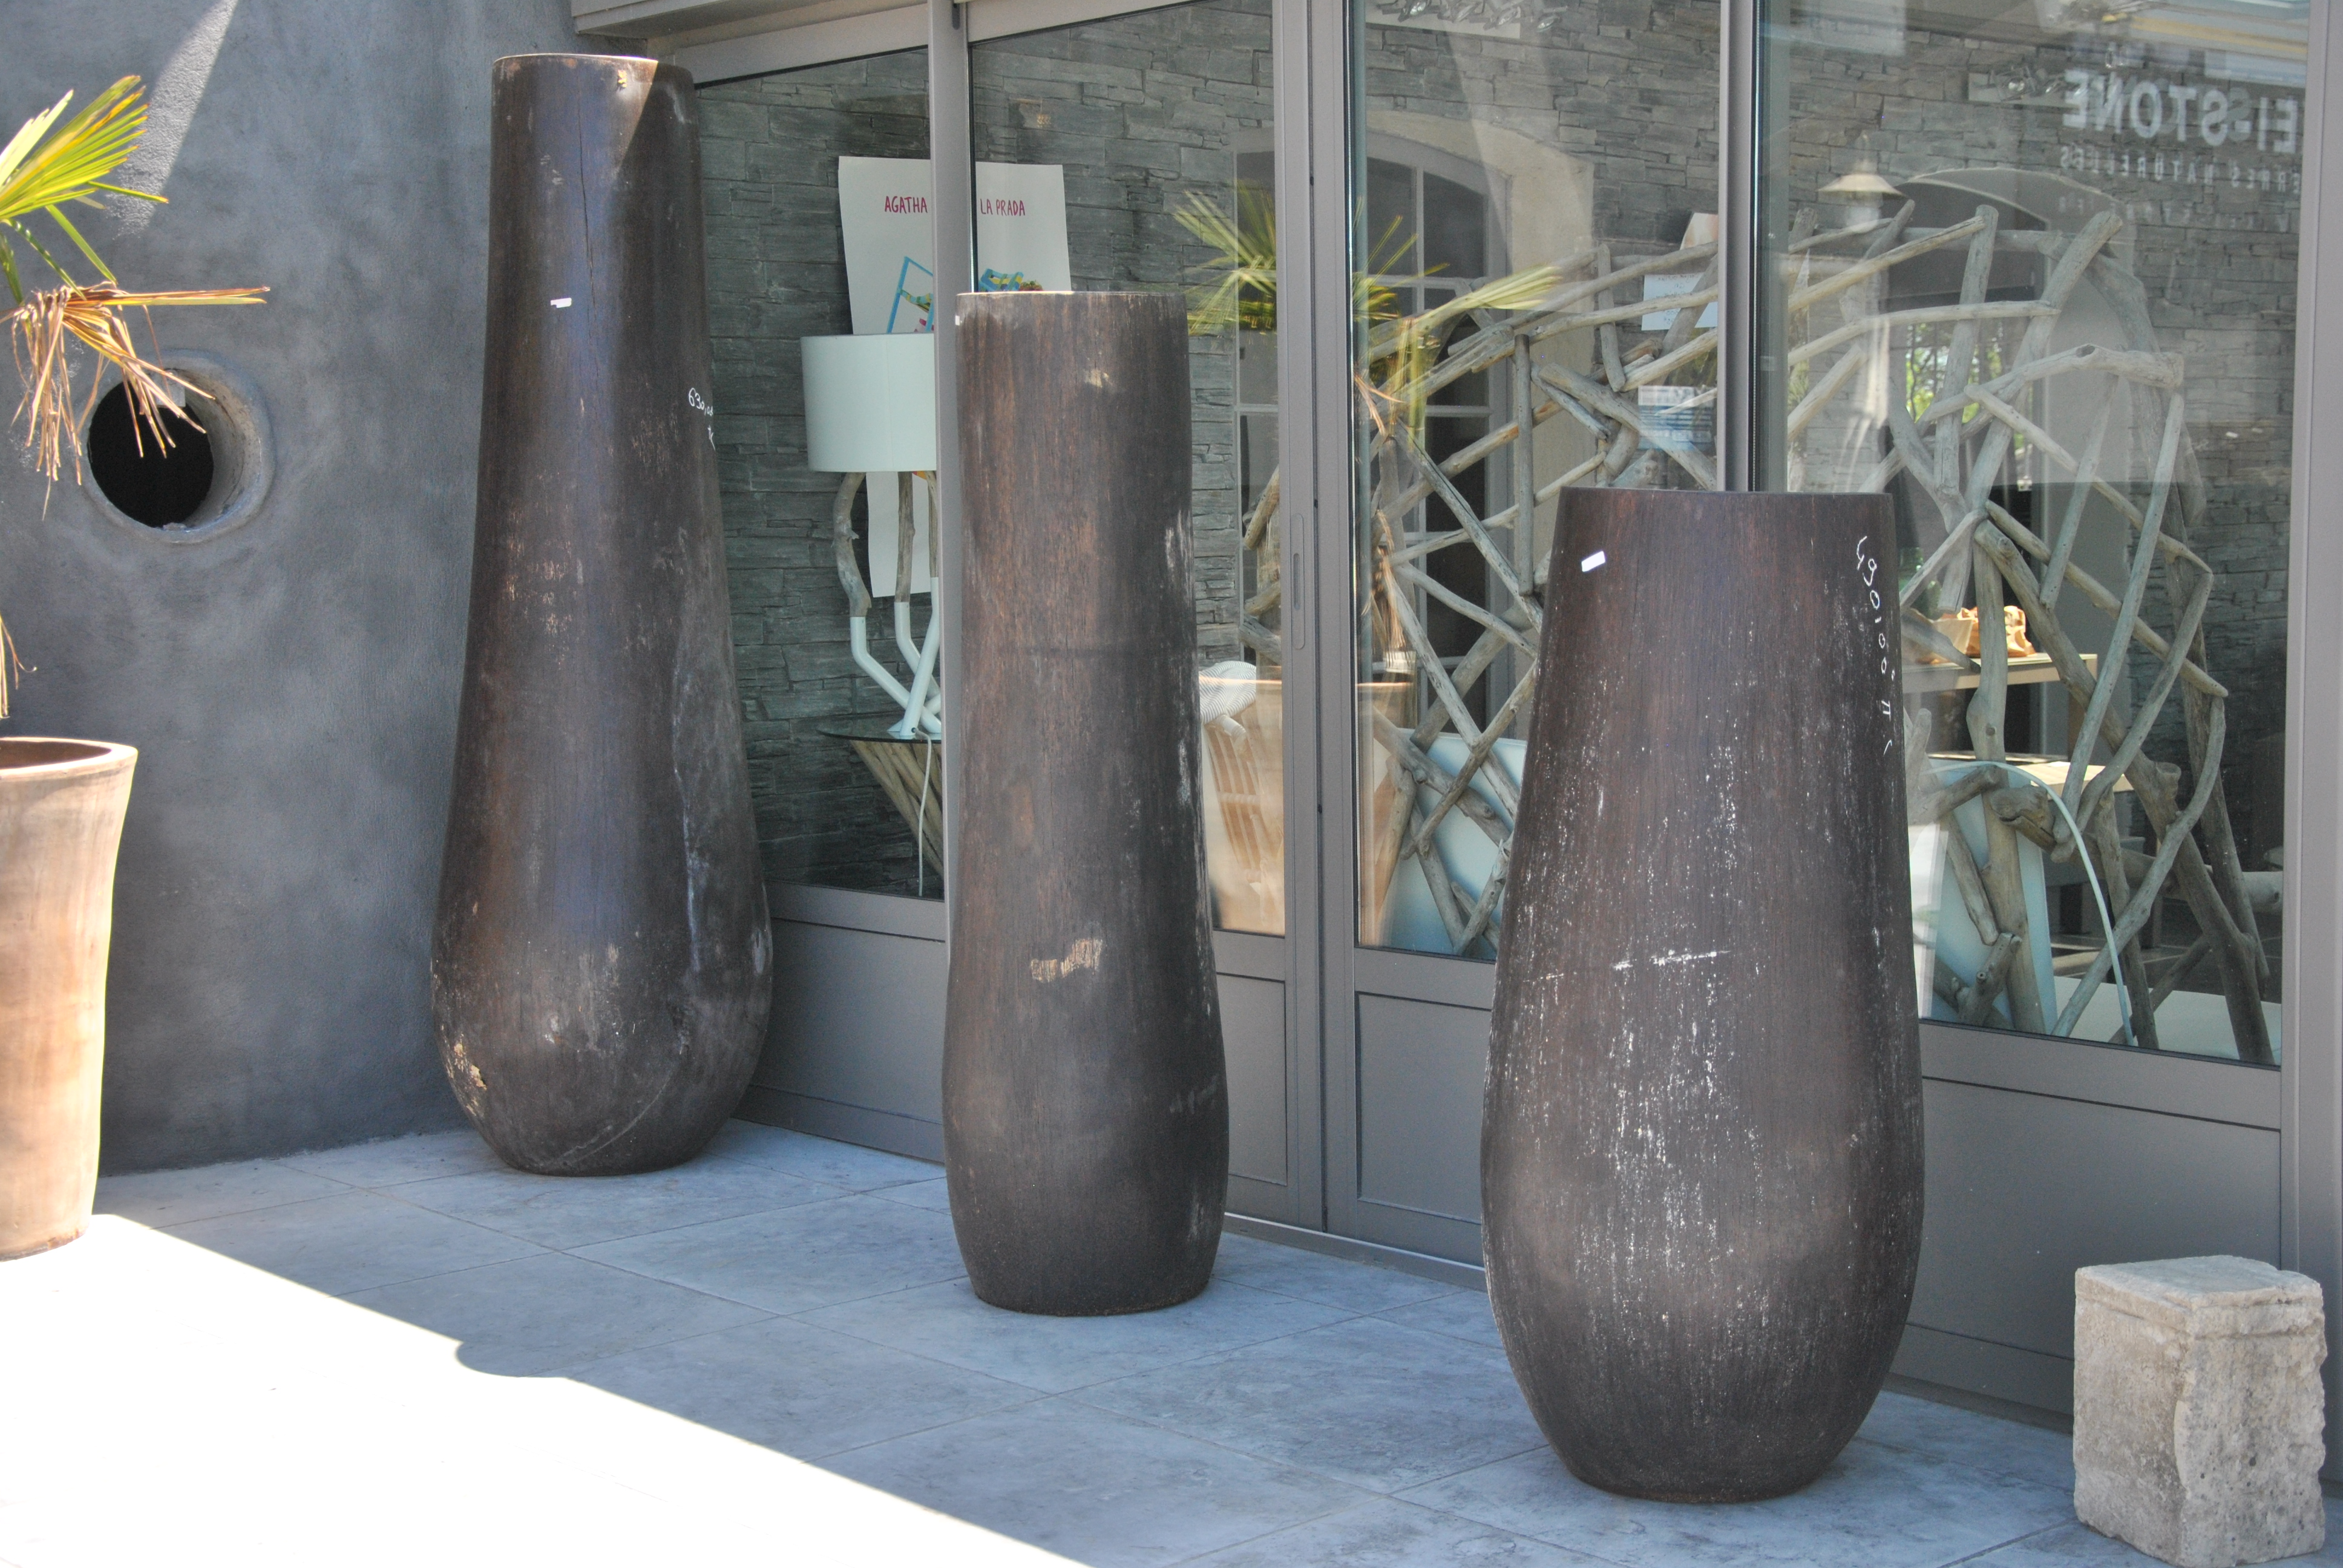 d coration de jardin aix en provence marseille kei stone. Black Bedroom Furniture Sets. Home Design Ideas